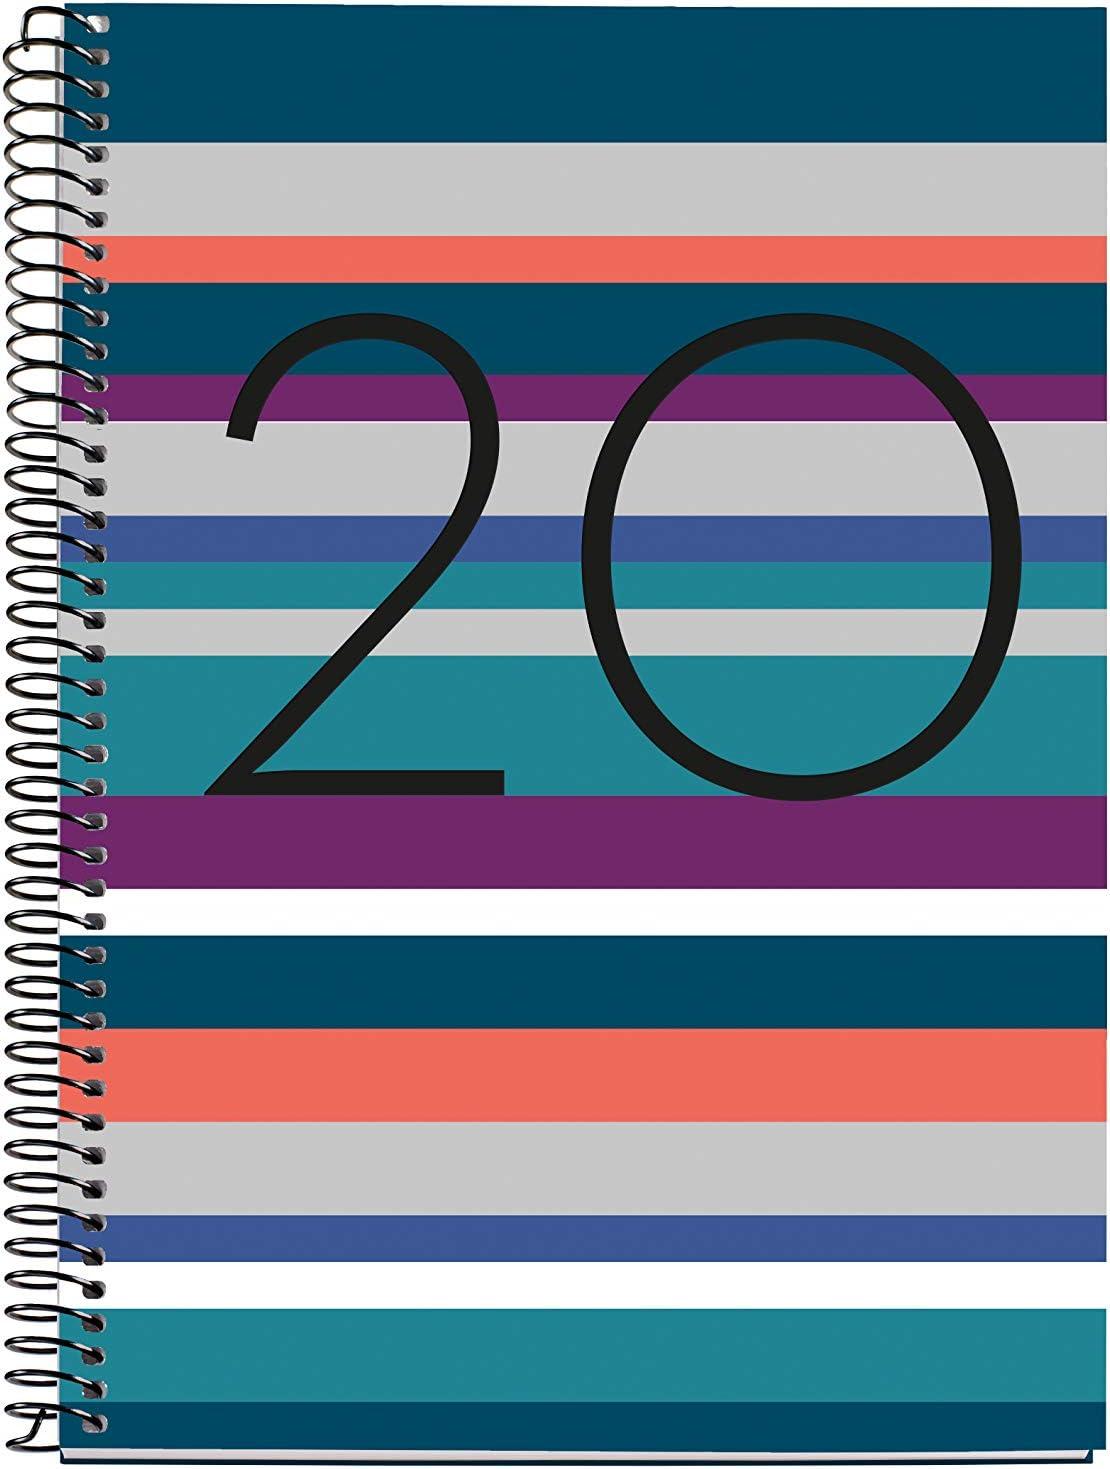 Miquelrius 34014 - Agenda 2020, Semana Vista Vertical (155 x 213 mm), sobremesa, Noruega, Castellano